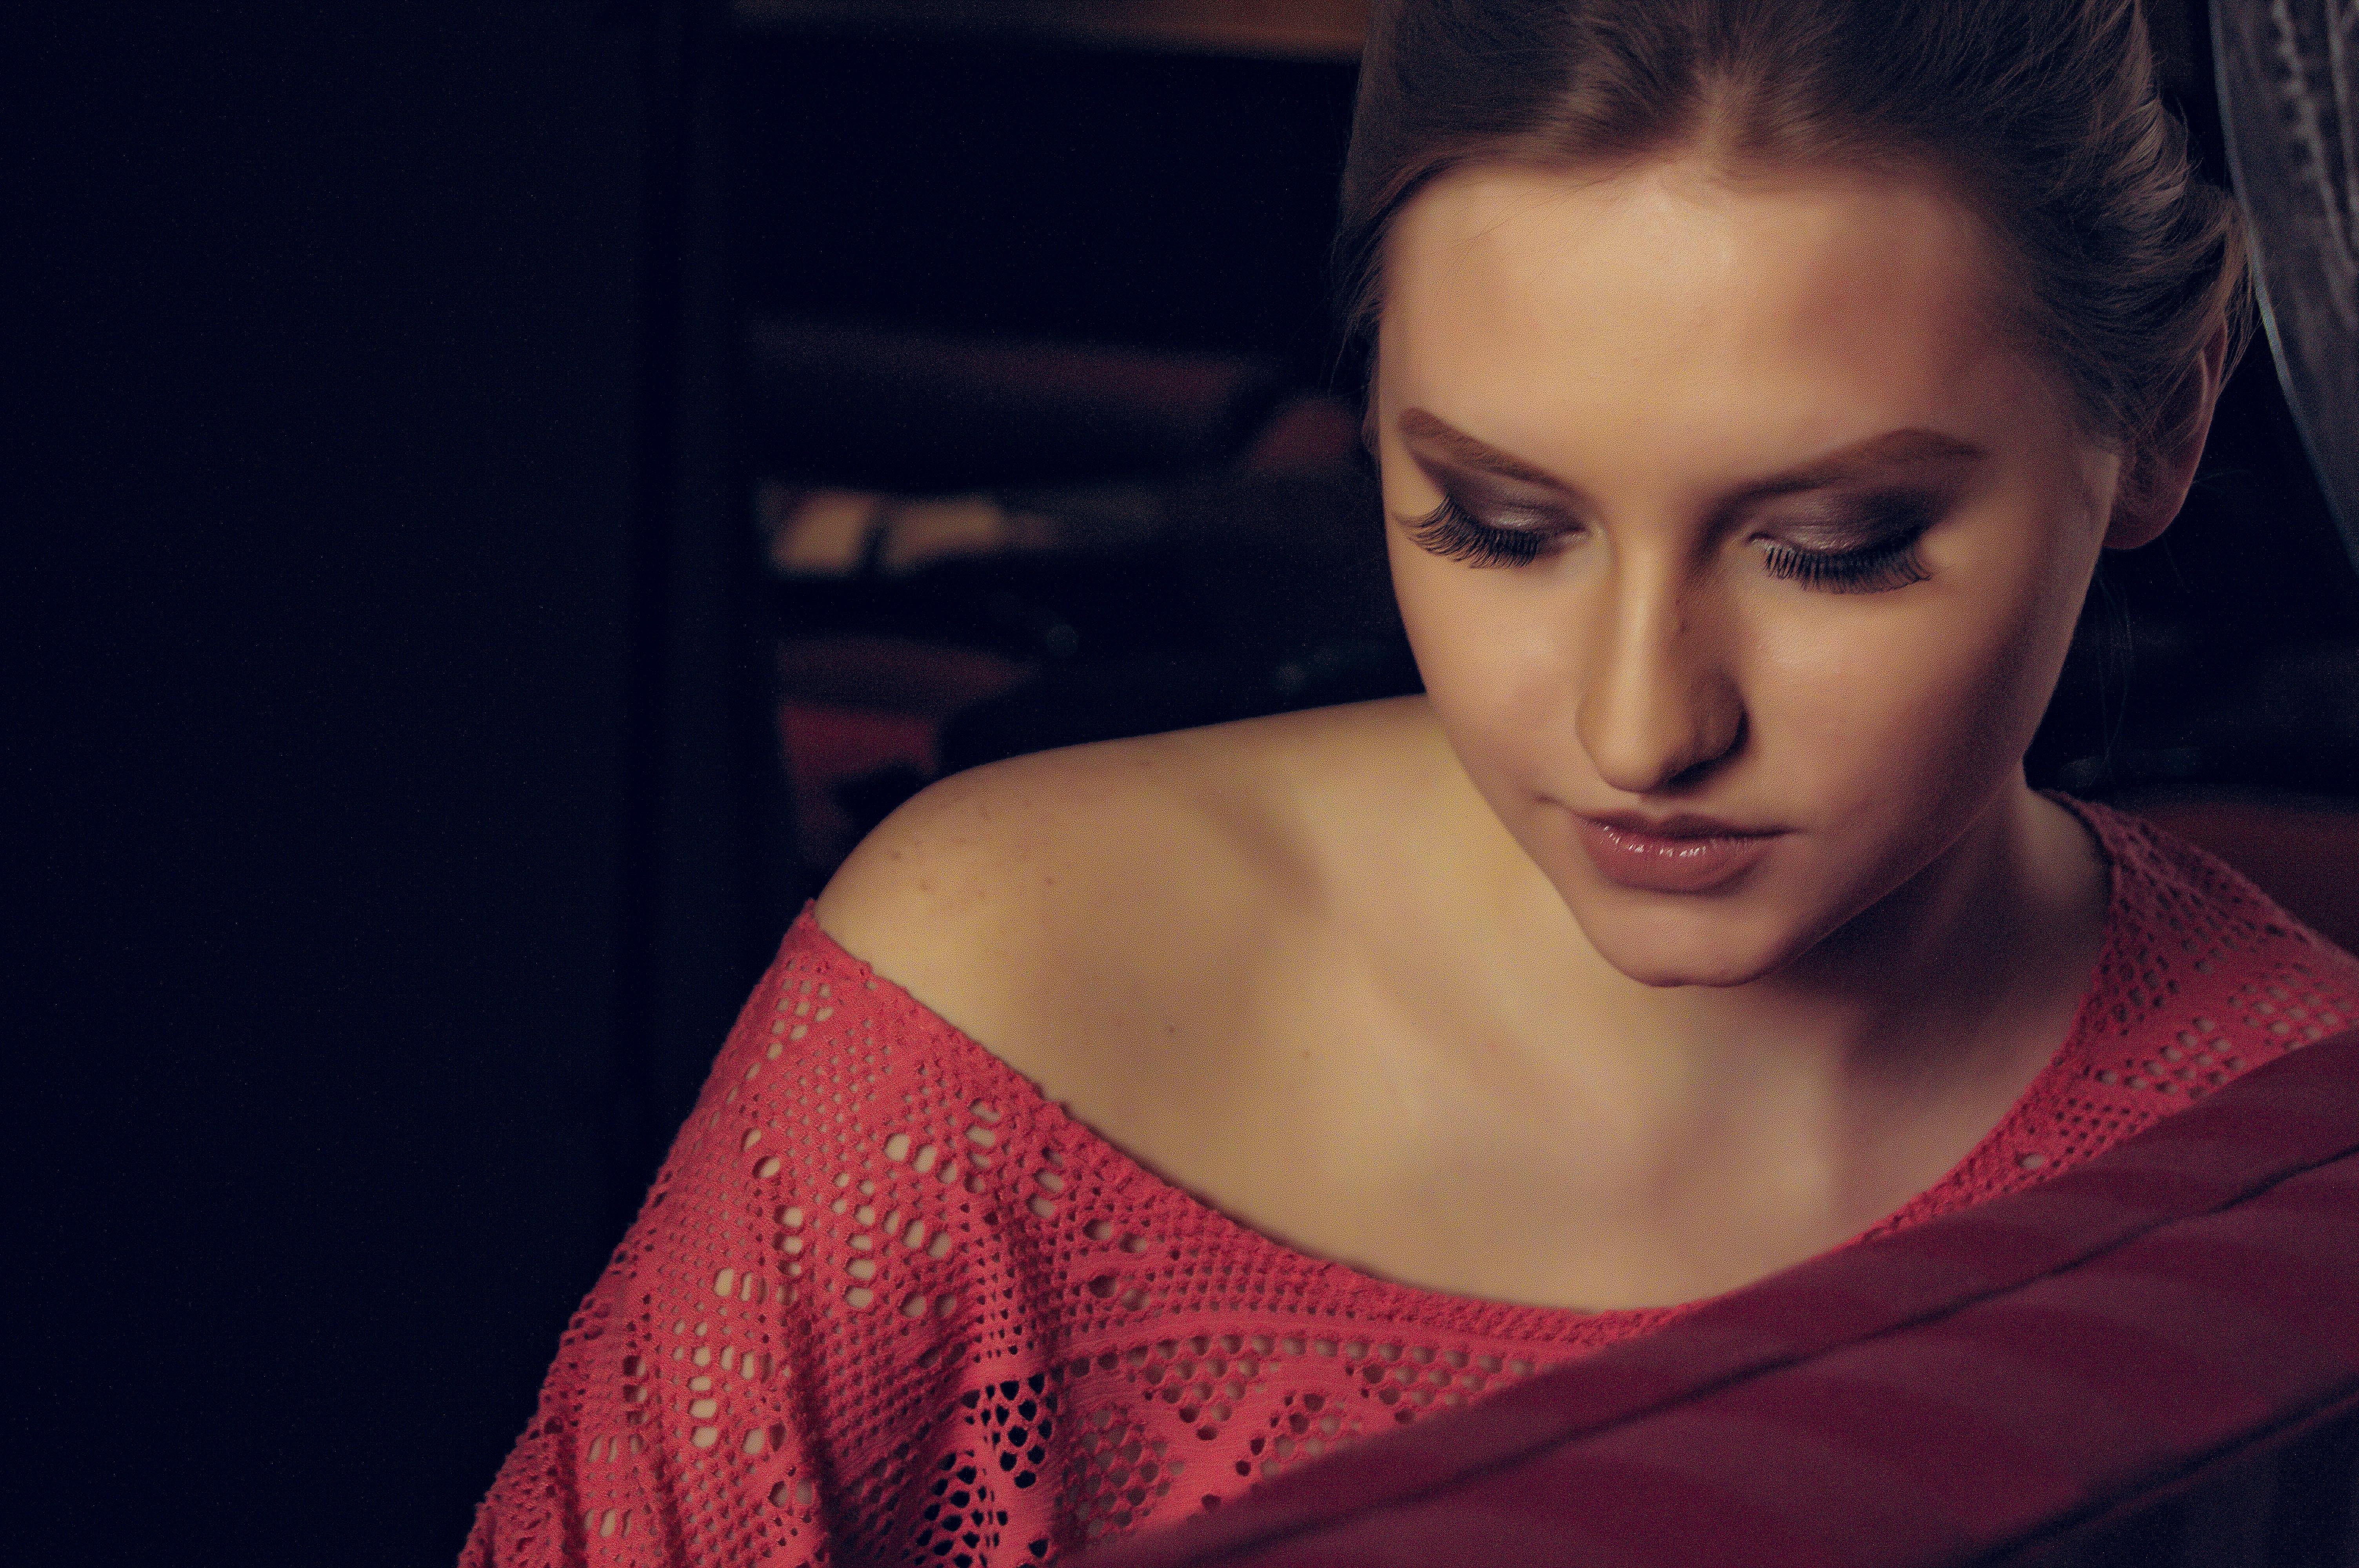 Woman in Red Off-shoulder Top